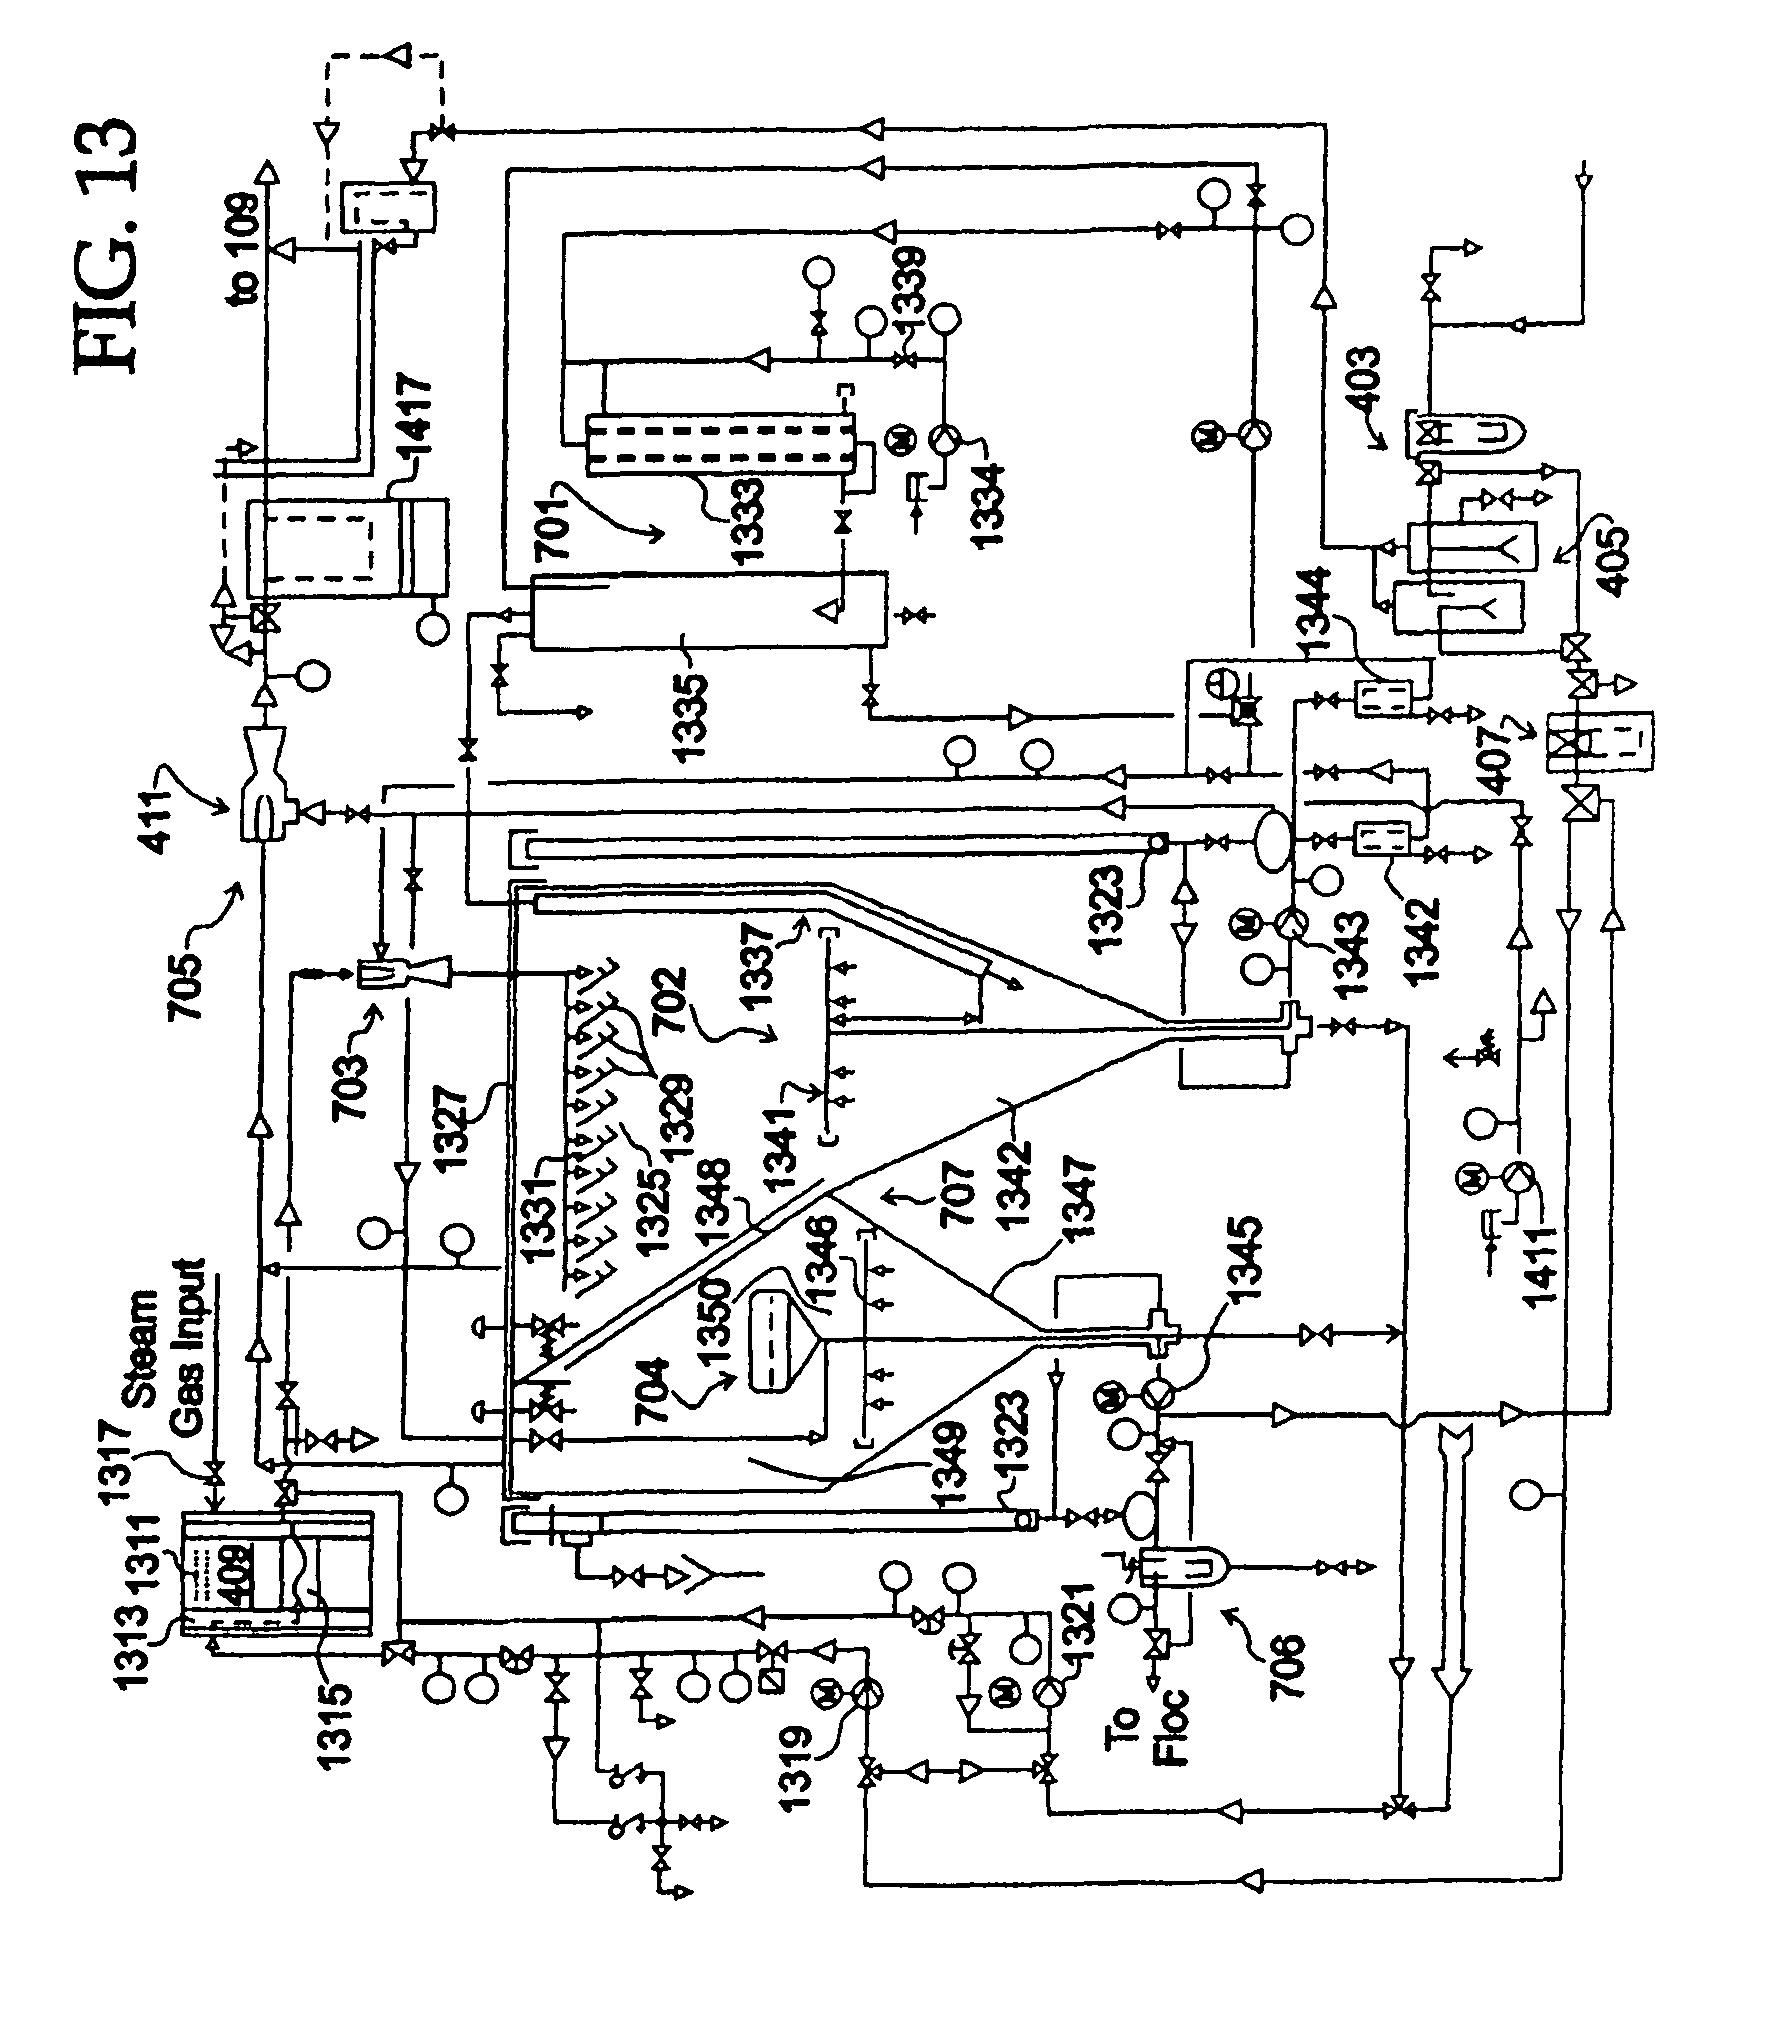 Leviton Security System Diagram, Leviton, Free Engine